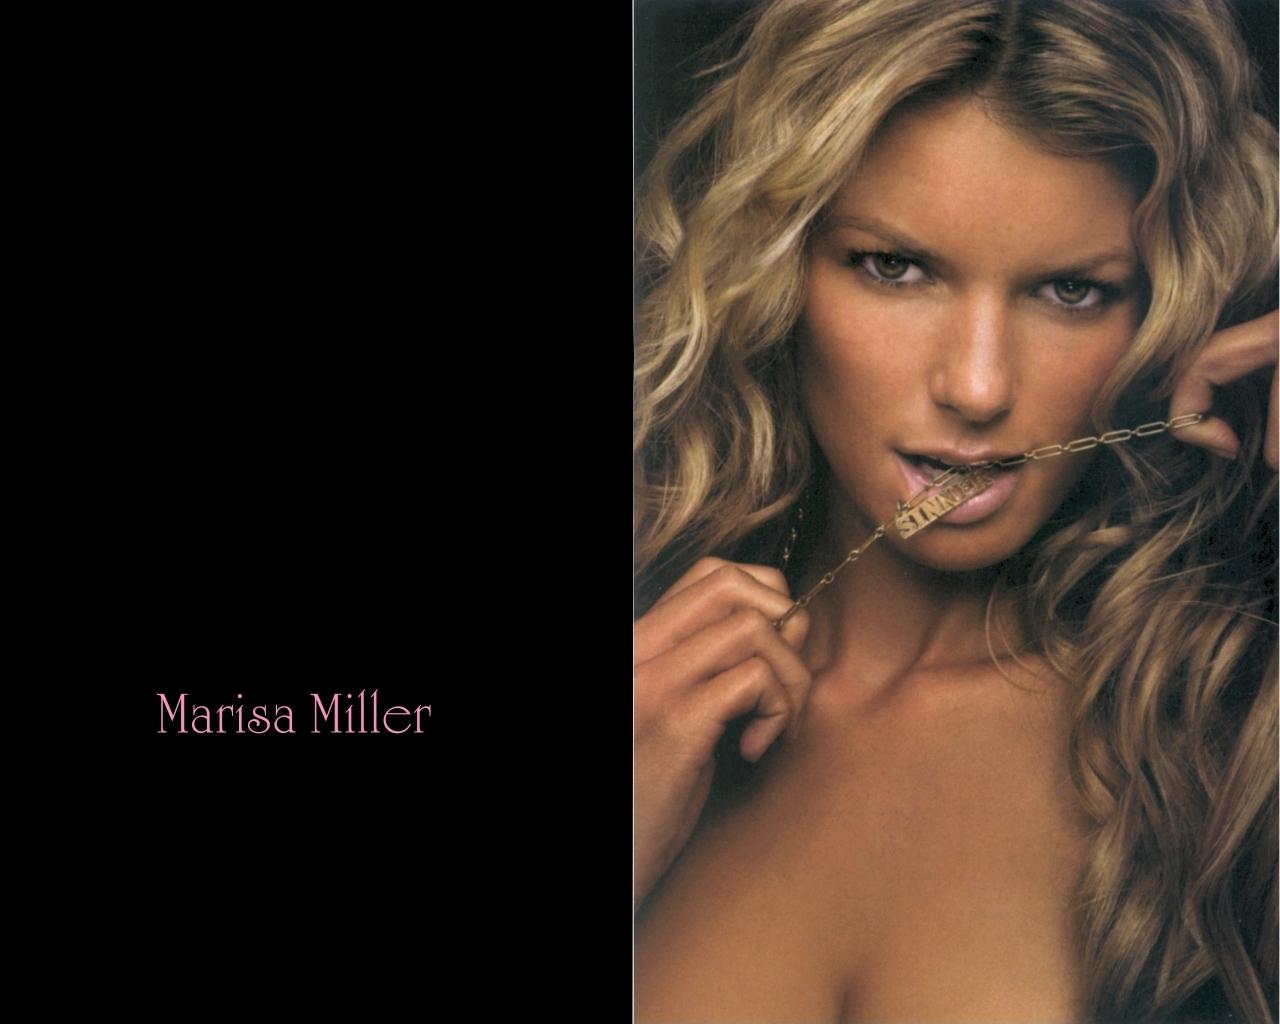 marisa miller 9 wallpaper - photo #37